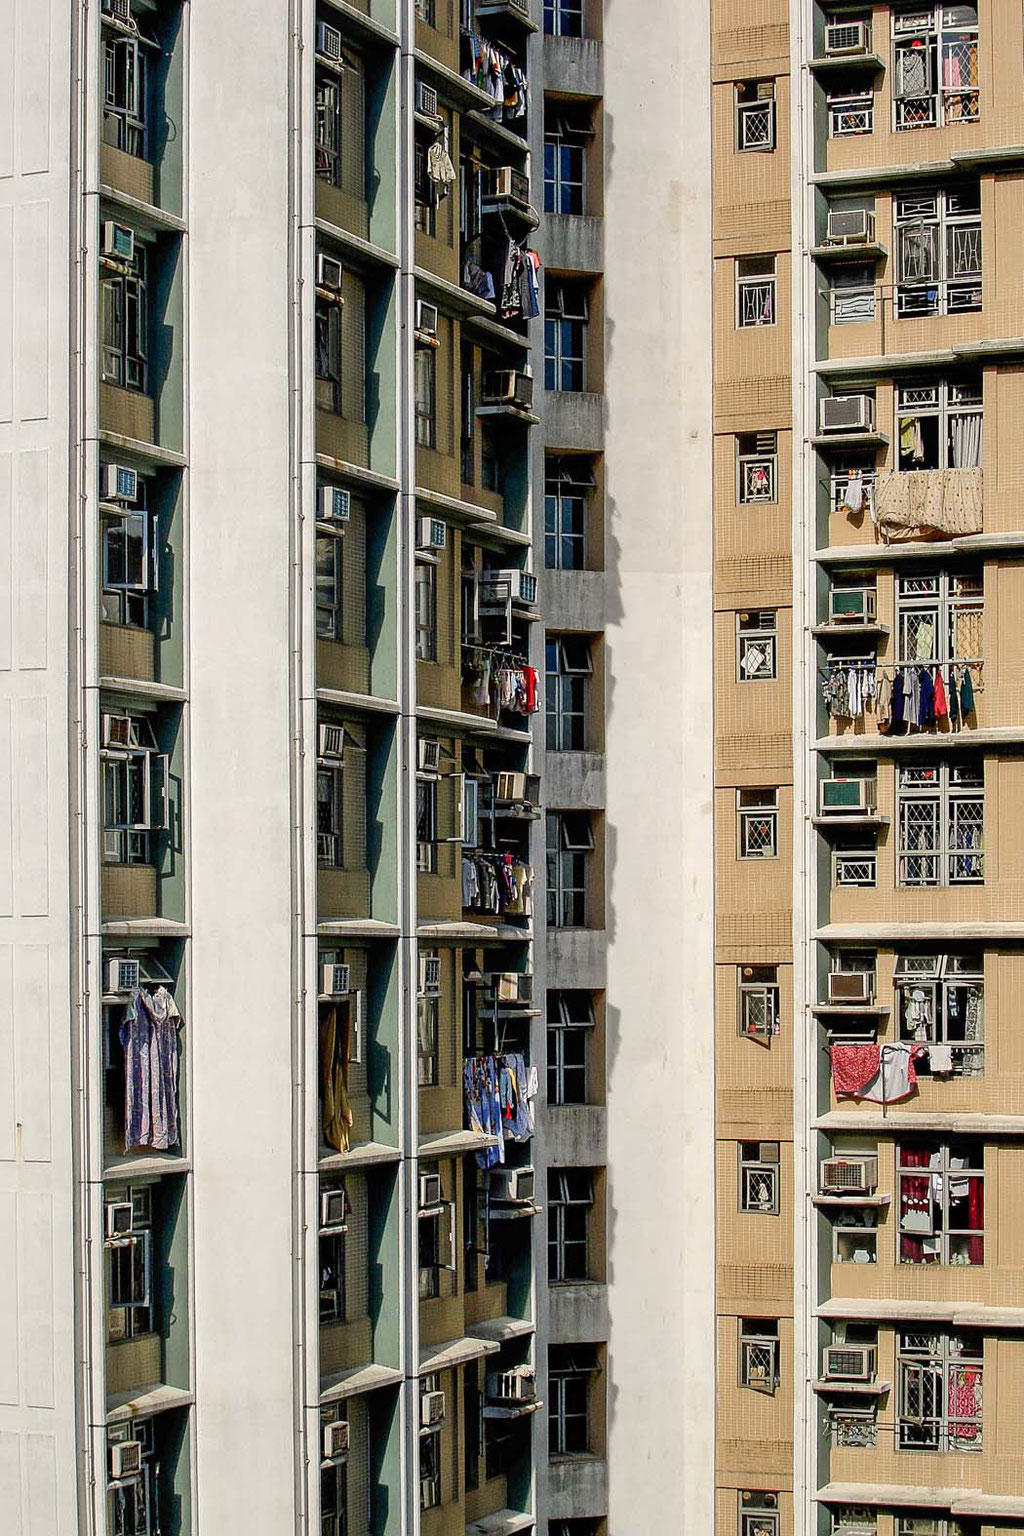 Shatin, New Territories (HK)